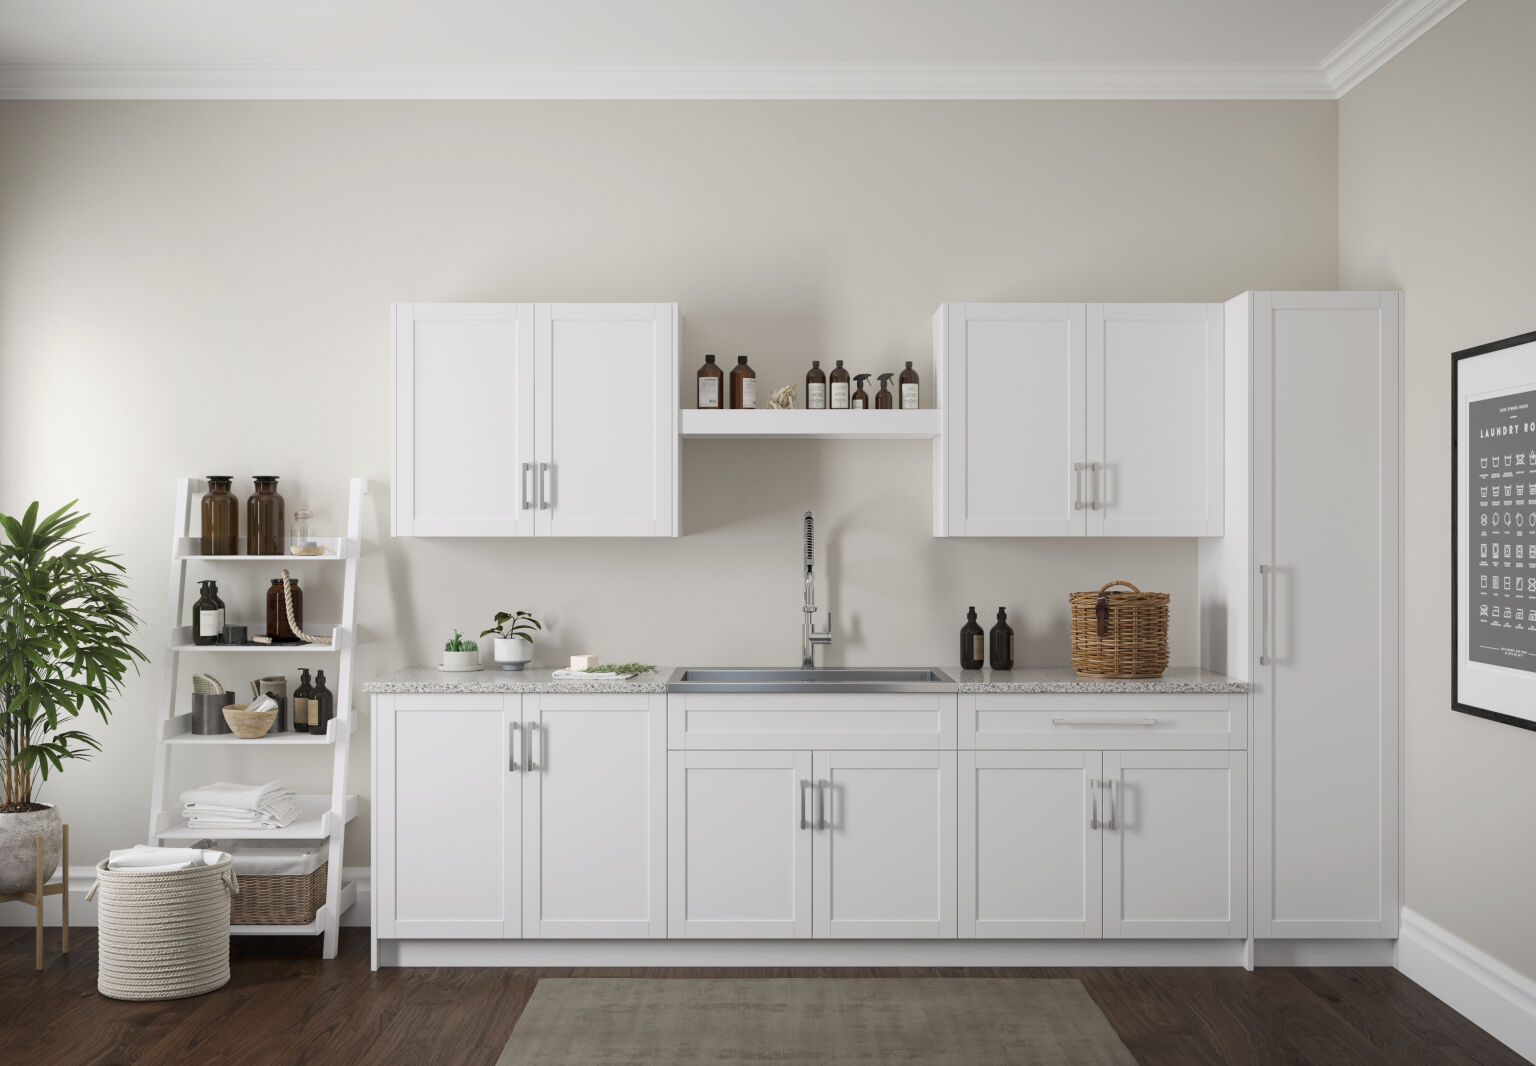 newage laundry cabinets